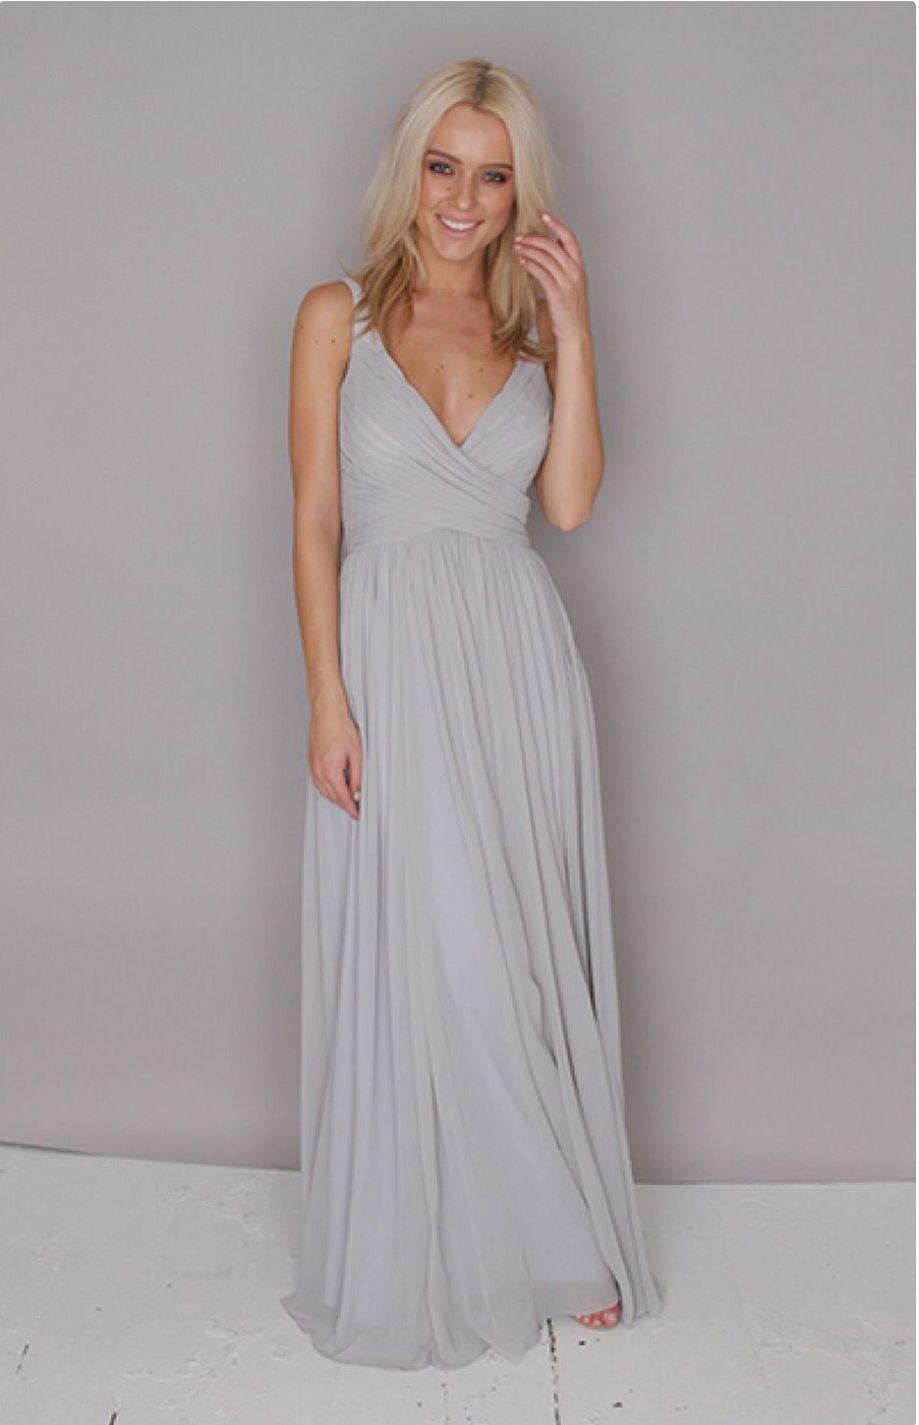 Folkster dove grey dress bridesmaids pinterest dove grey and folkster dove grey dress ombrellifo Gallery